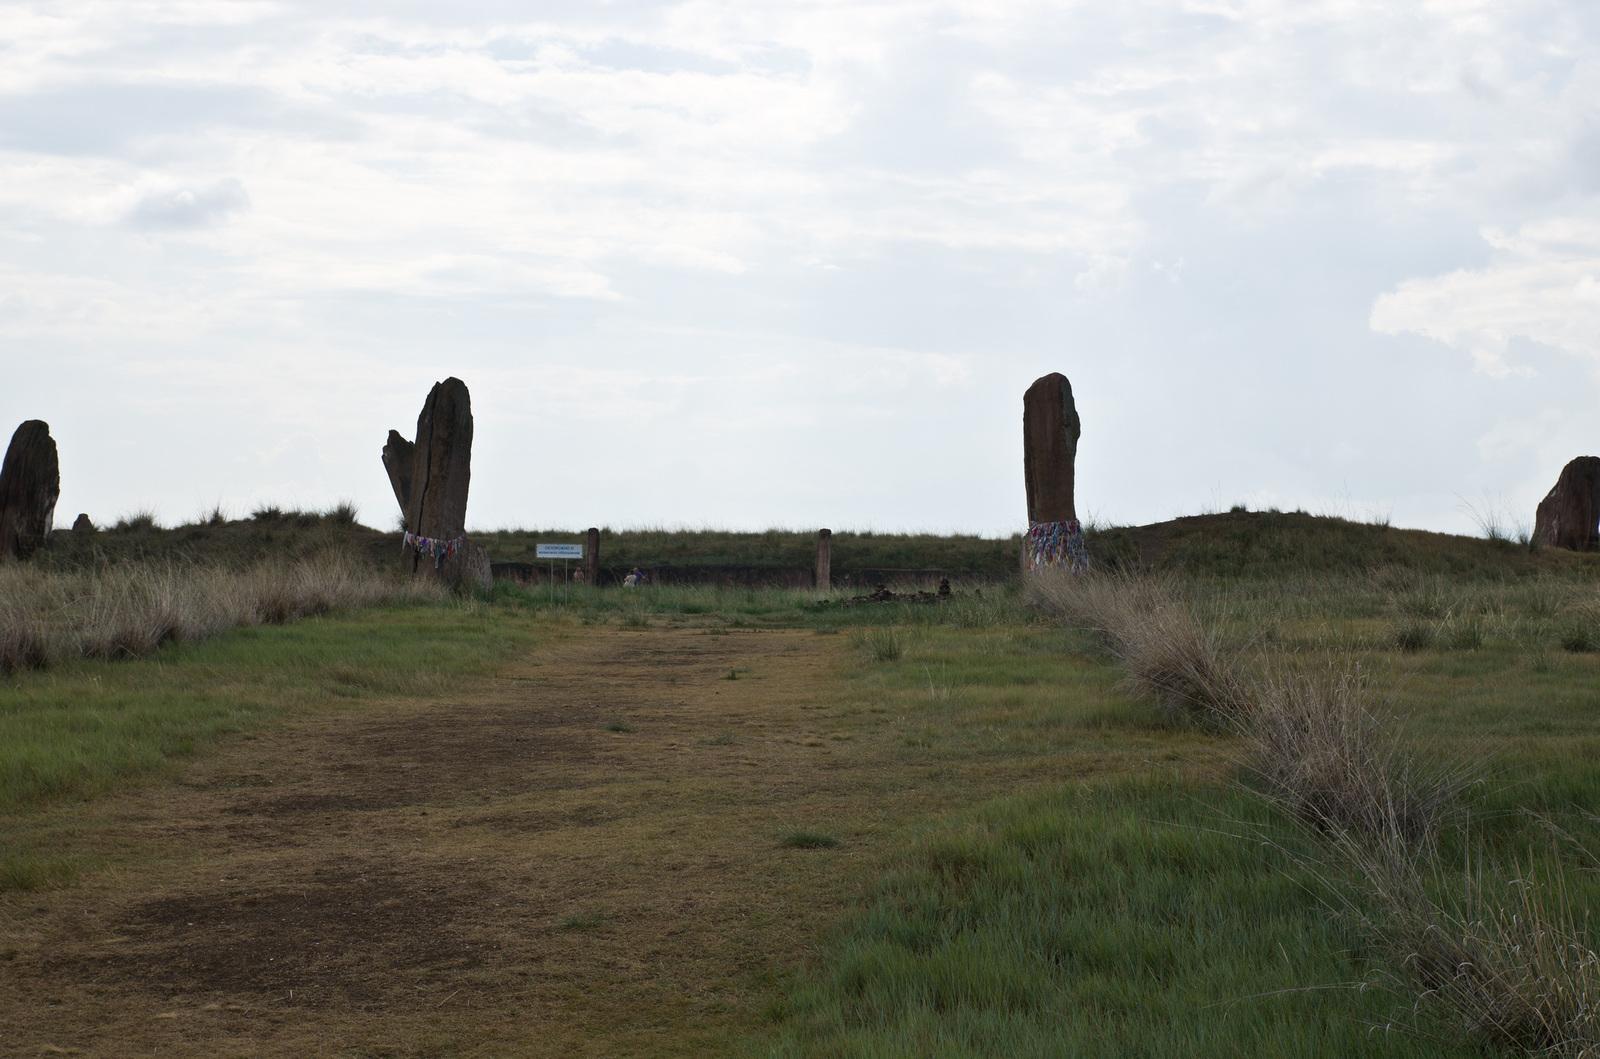 Салбыкская курганная группа (Хакасия)